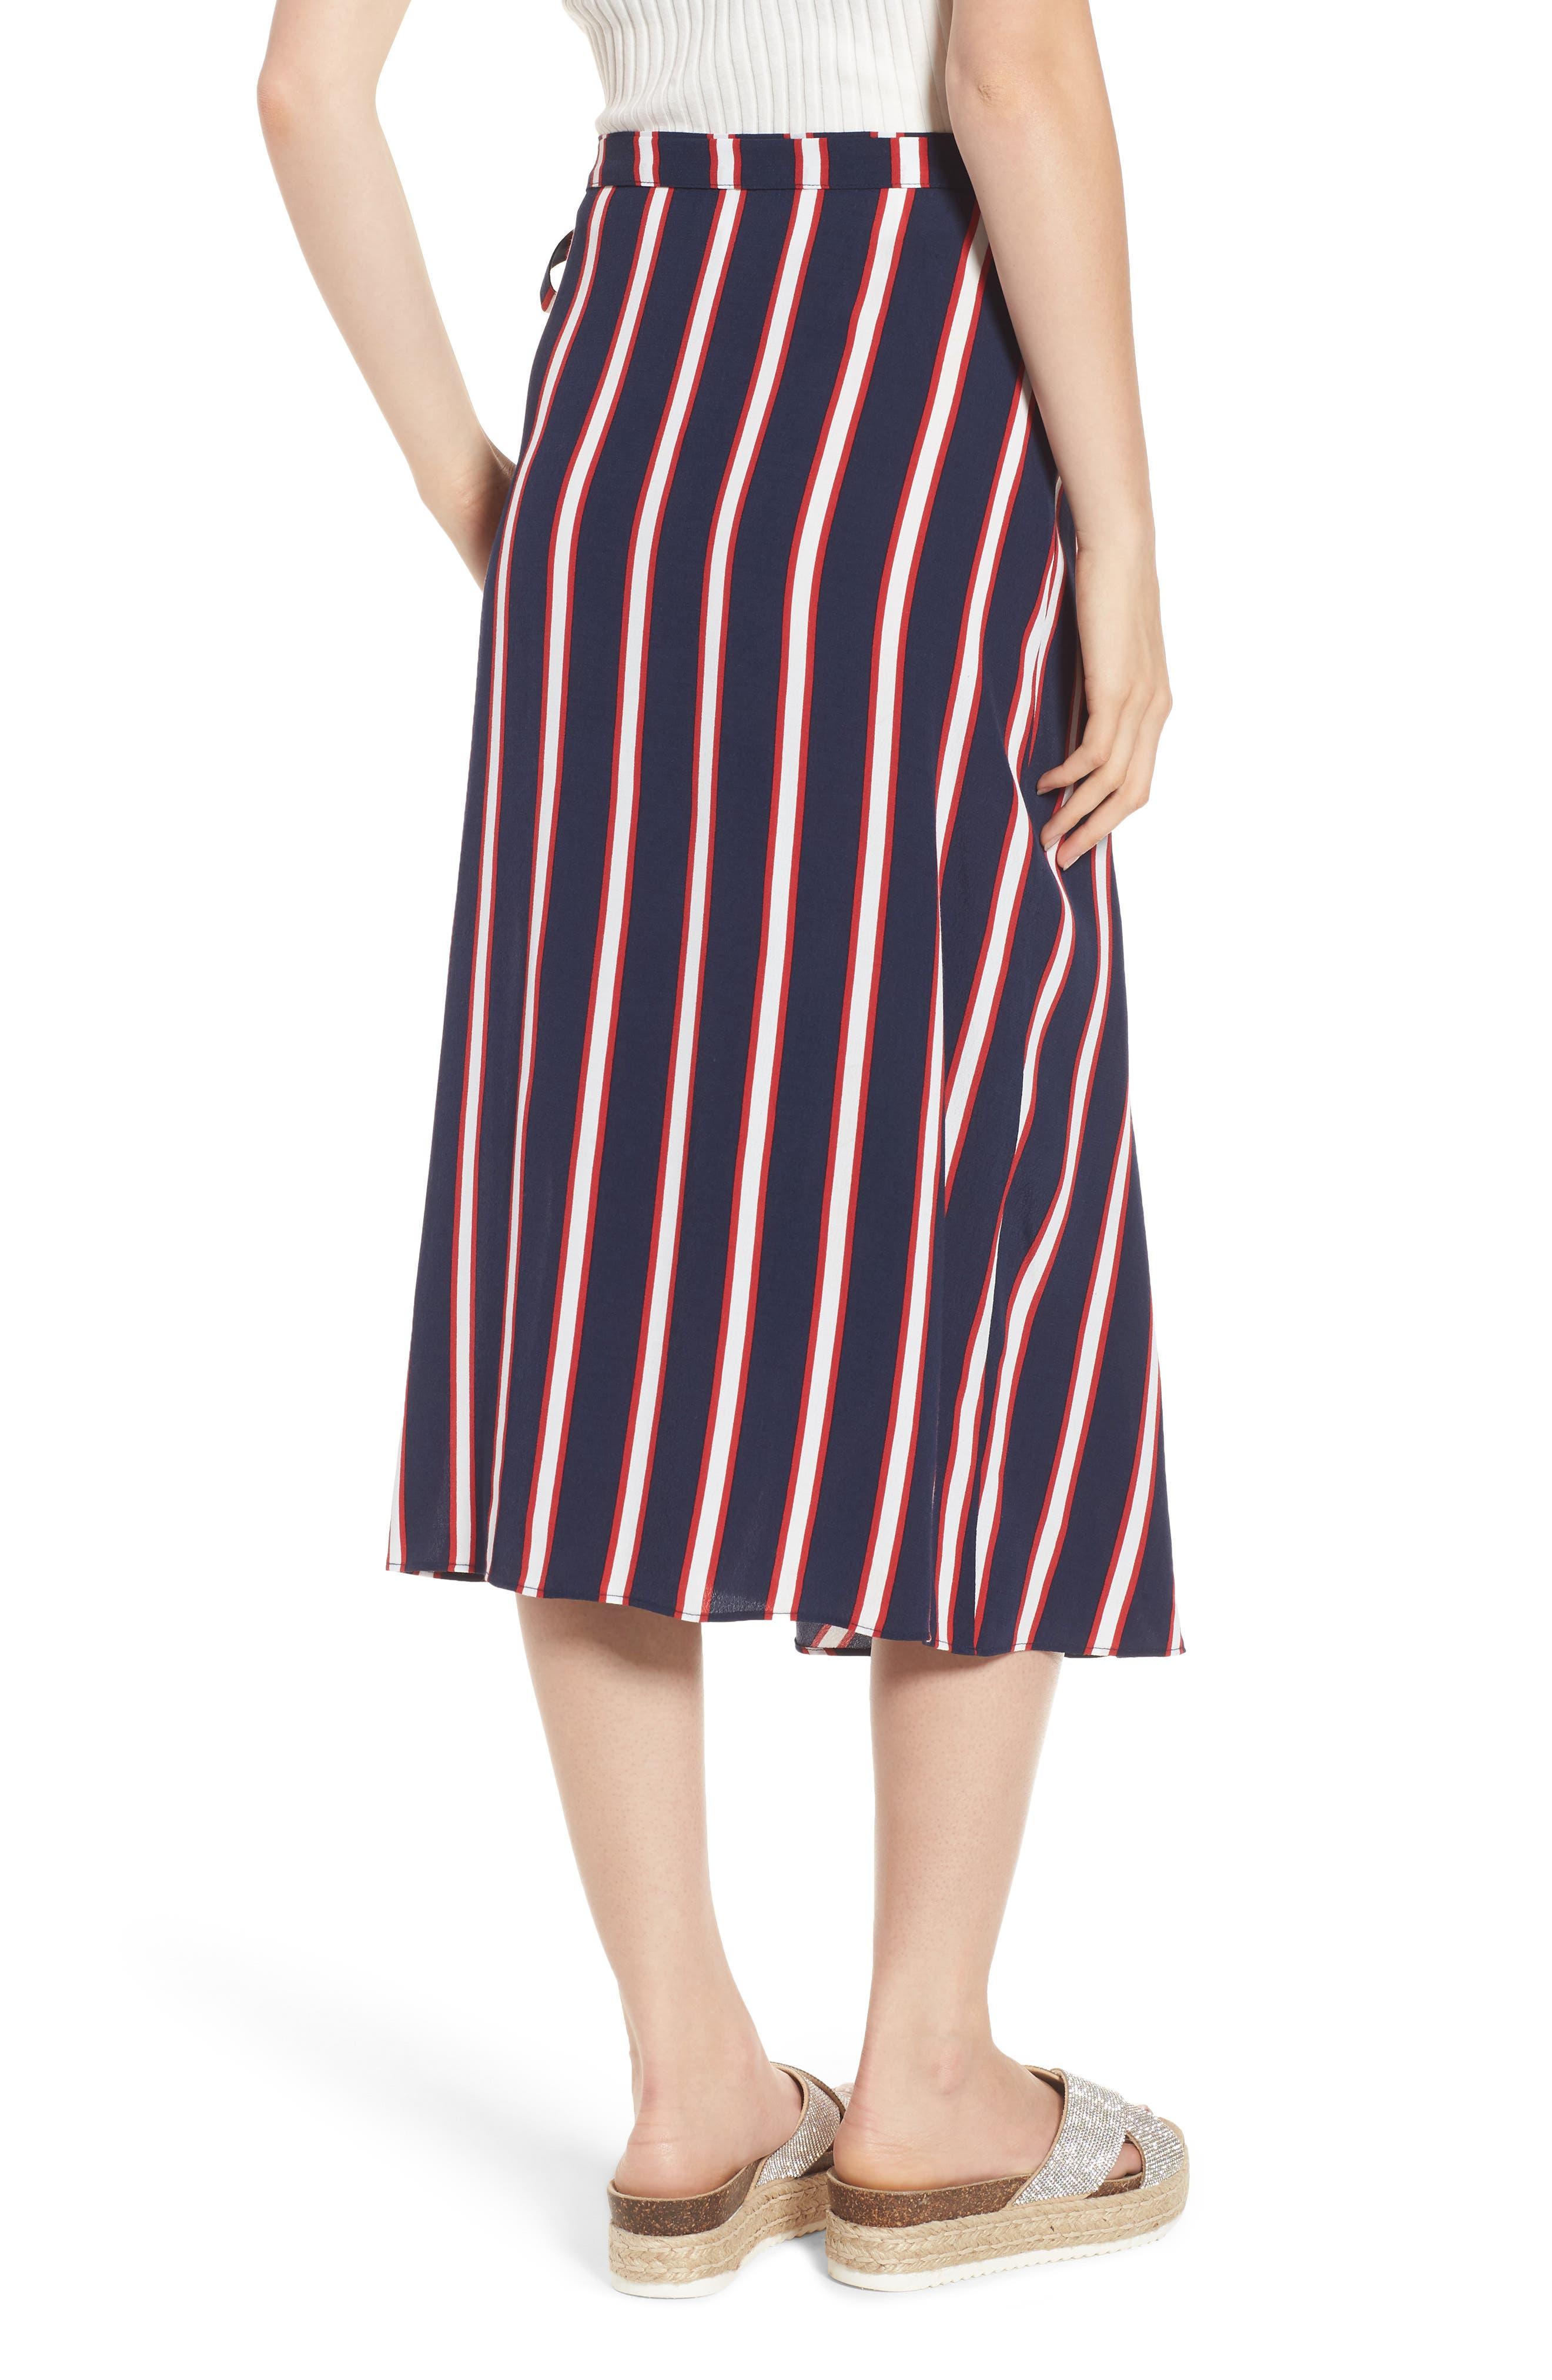 Stripe Midi Wrap Skirt,                             Alternate thumbnail 2, color,                             Navy Peacoat Awning Stripe